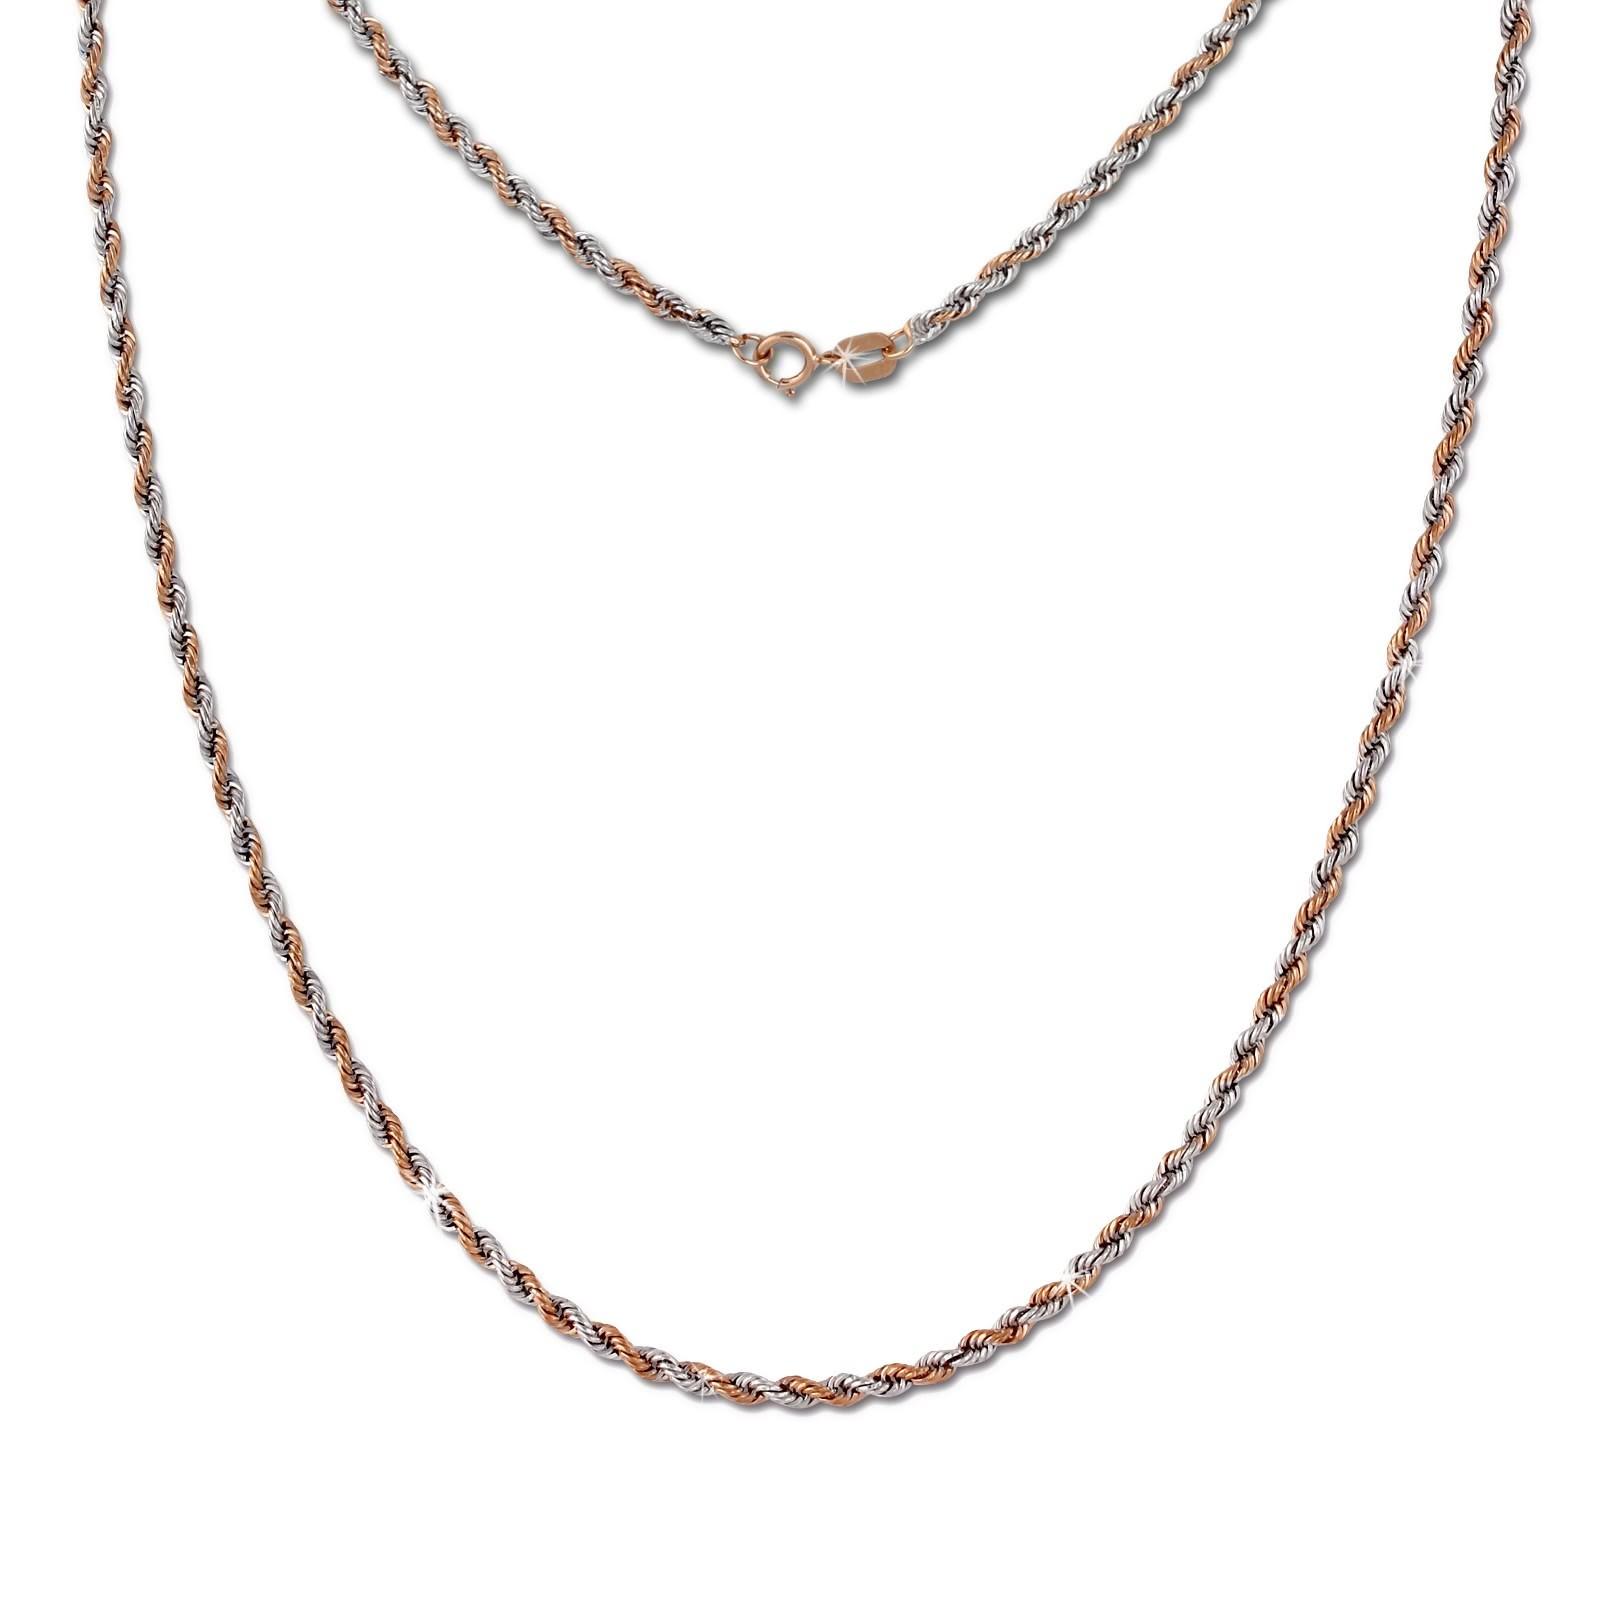 SilberDream Collier Kette Zopf Rose Gold Damen 45cm 8 Karat GDK00245T